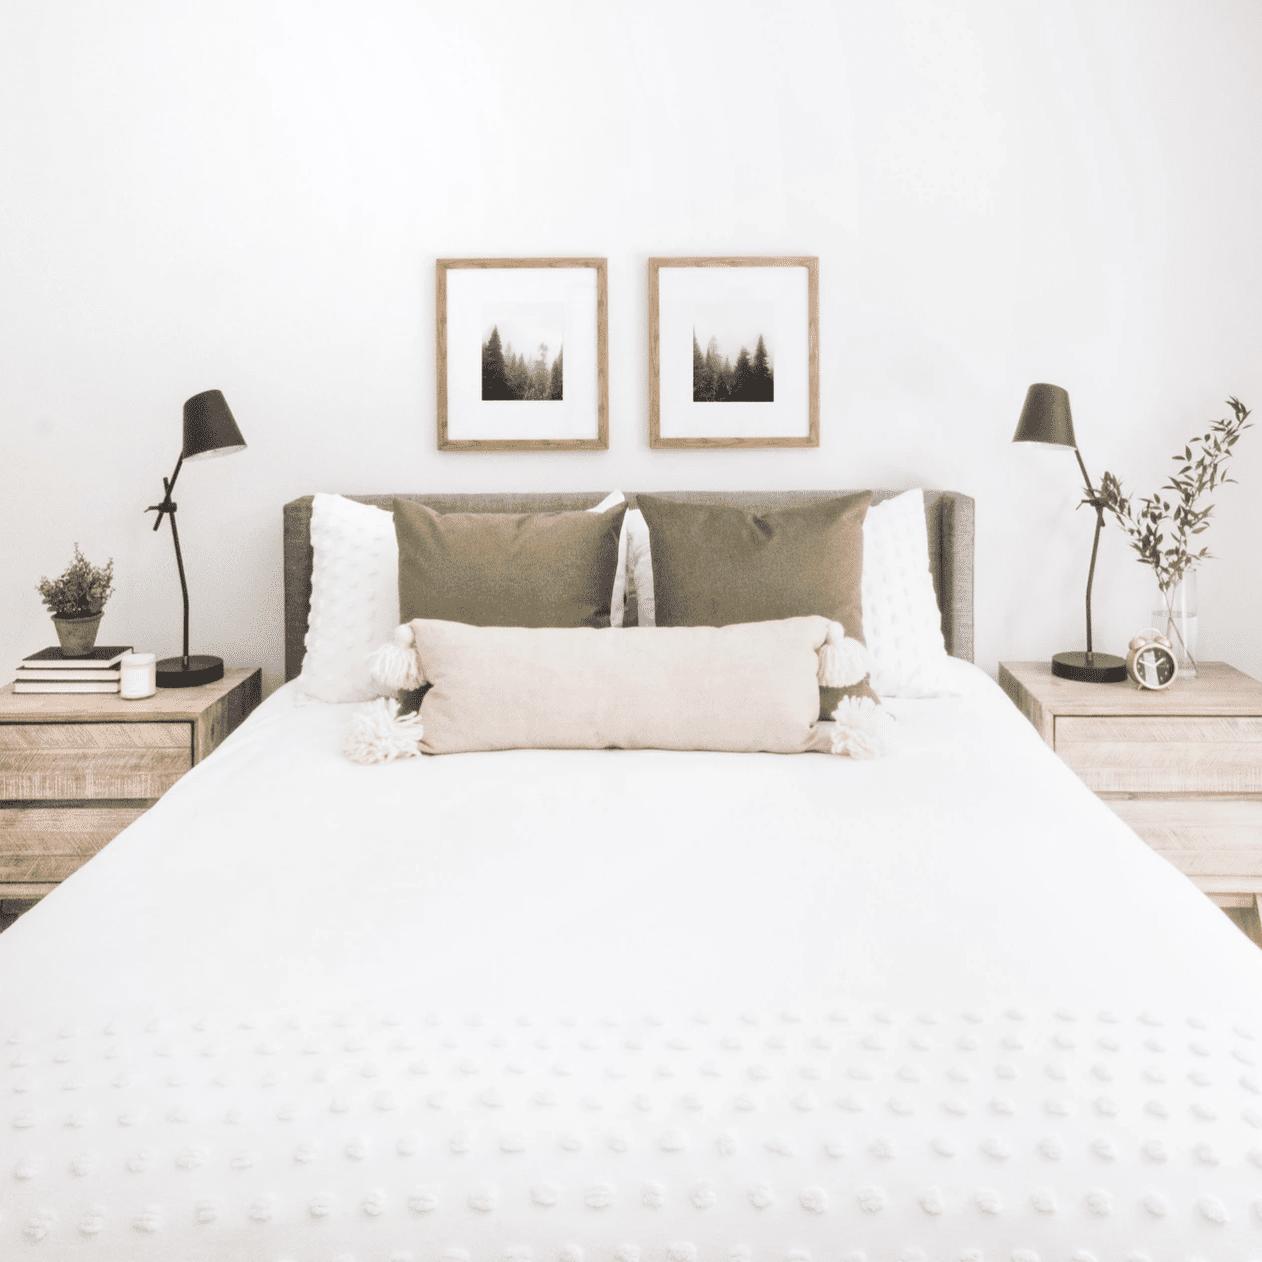 31 Modern Bedroom Lighting Ideas Worth Recreating